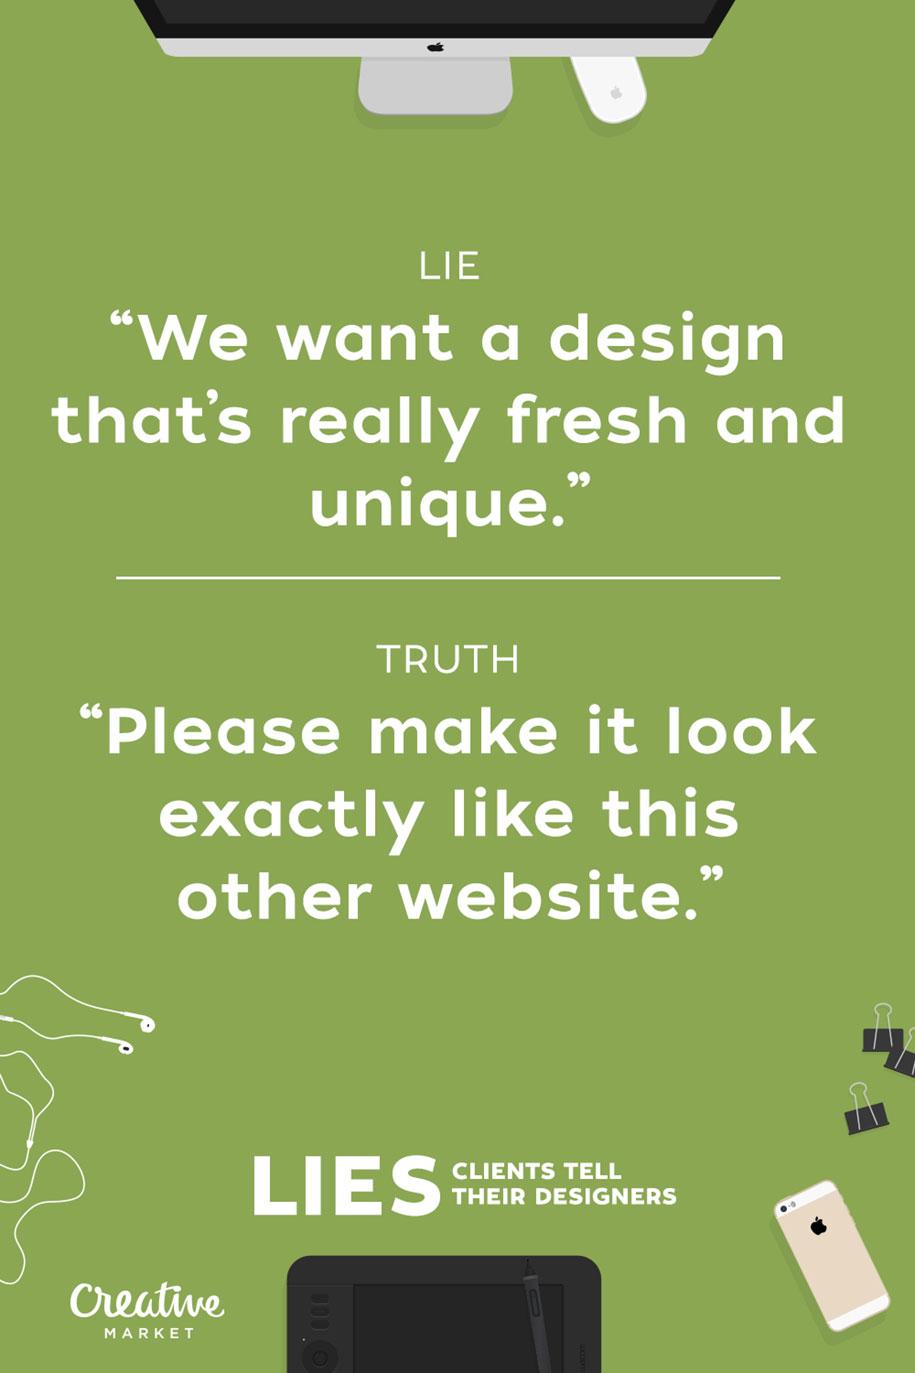 15-lies-clients-tell-designers-joshua-johnson-creative-market-5